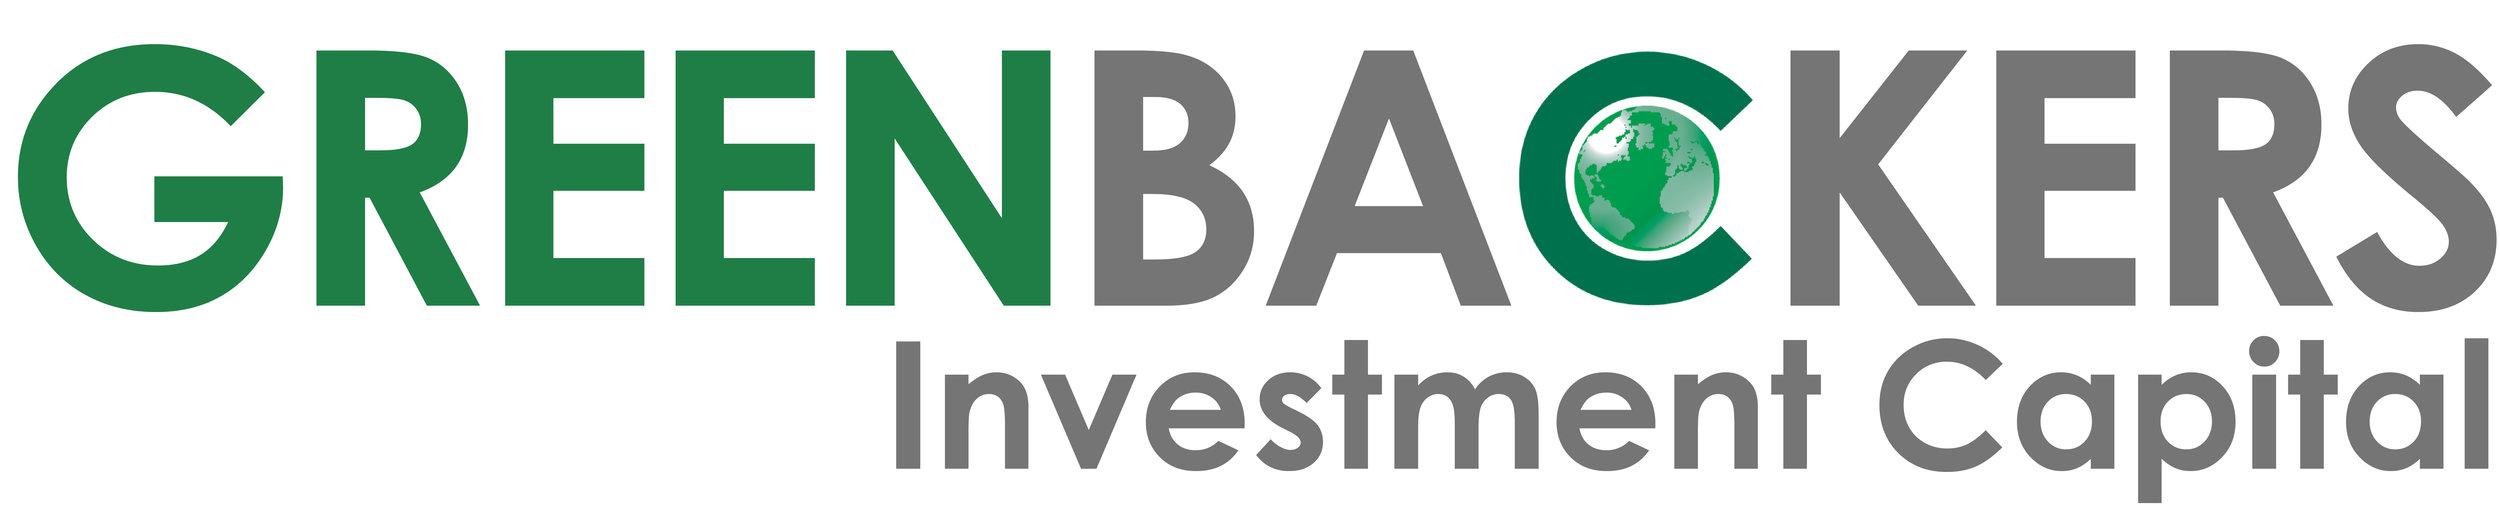 GreenBackers Investment Capital Logo.jpg